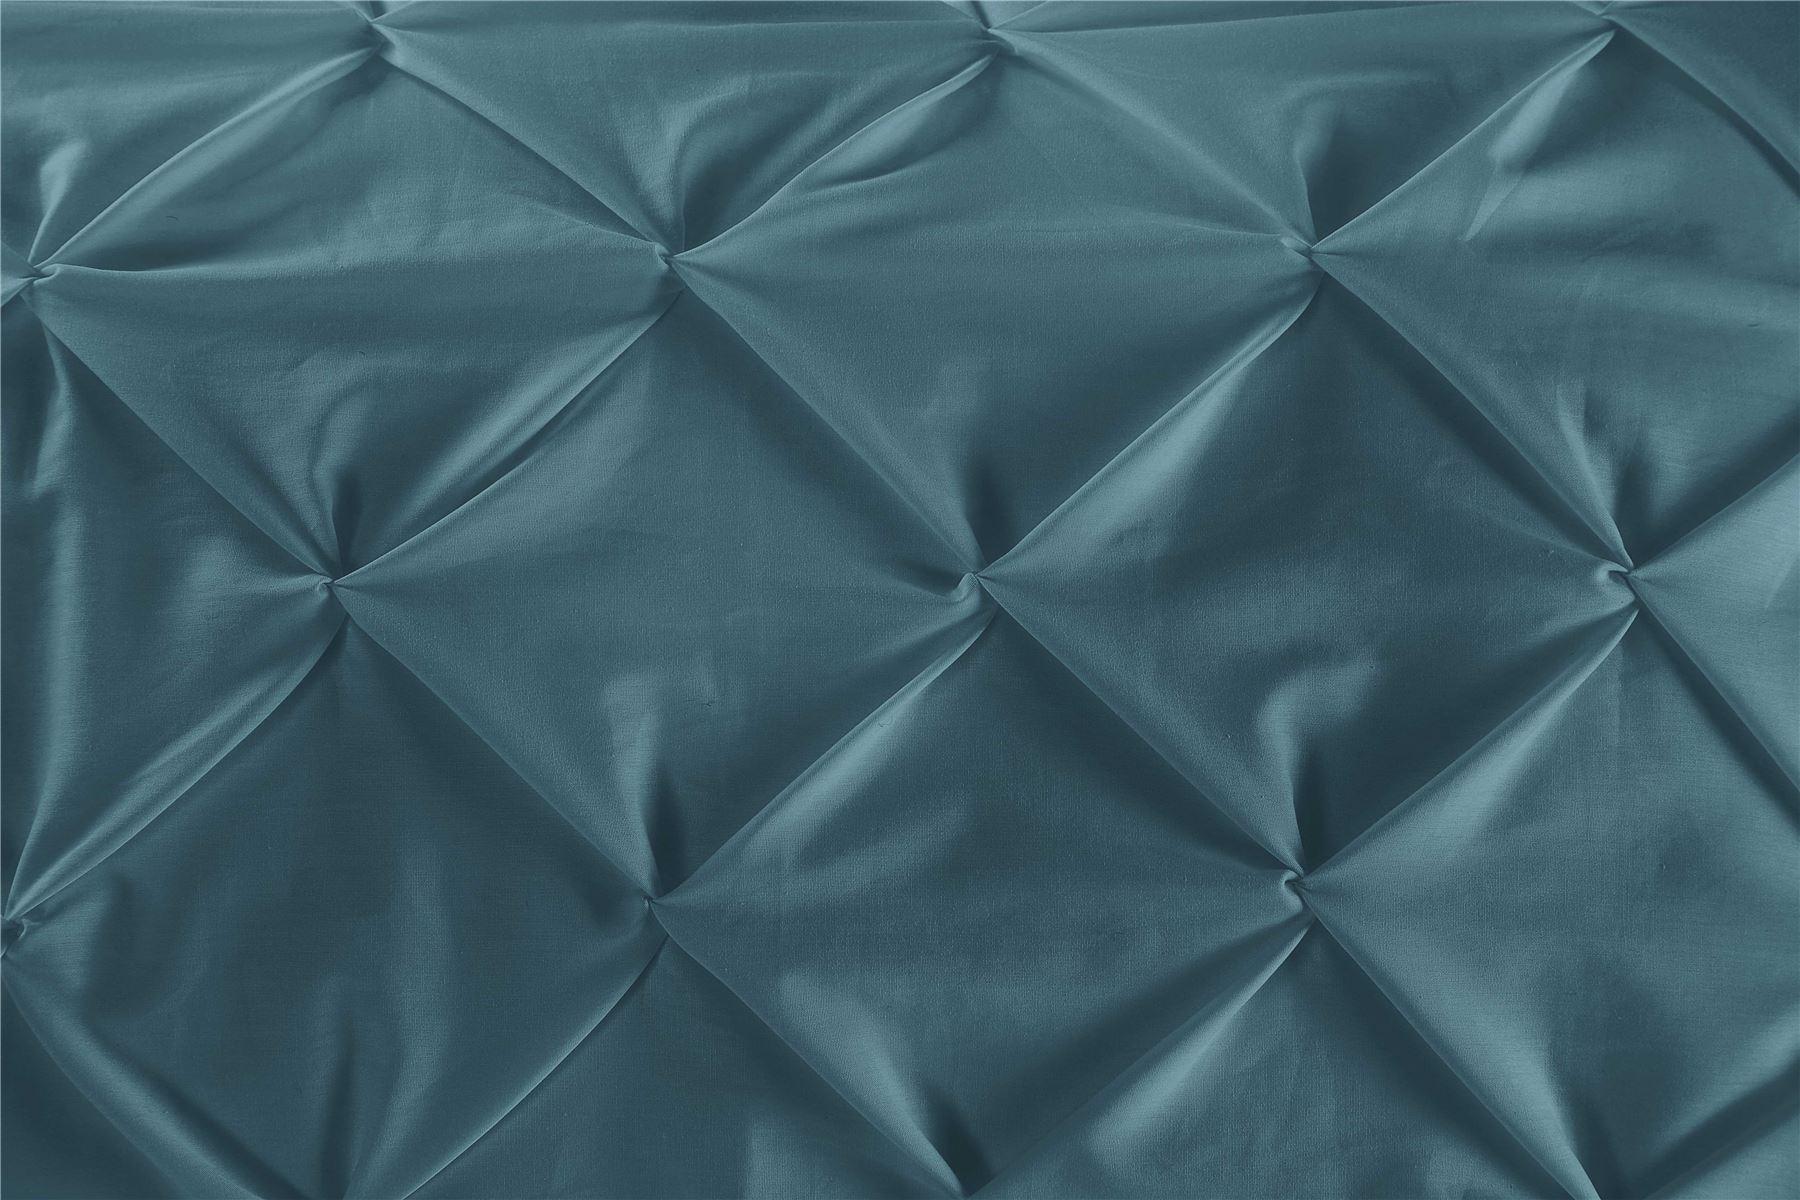 Luxury-Pure-100-Cotton-200-Thread-Pinch-Pleat-Pintuck-Puckering-Duvet-Cover-Set thumbnail 61